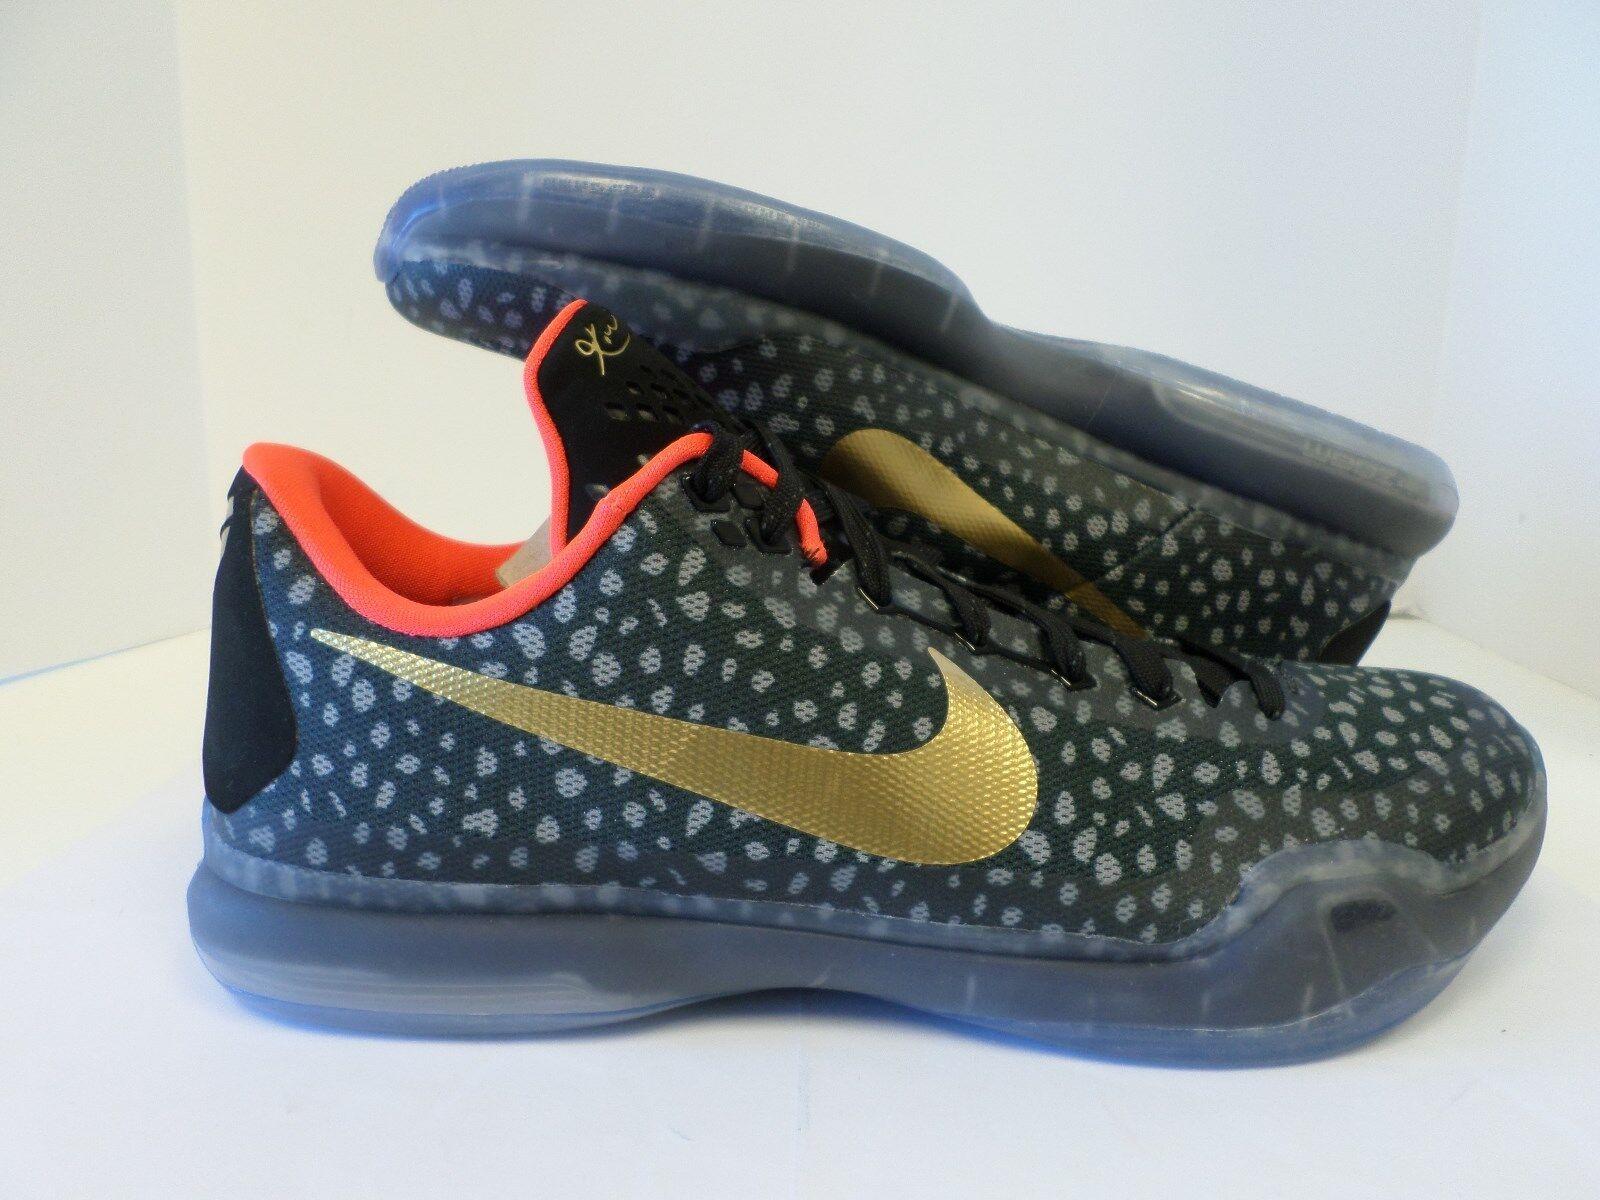 New Nike Men's Kobe iD Basketball Shoe Gray/Black/Gold/Crimson 777411-971